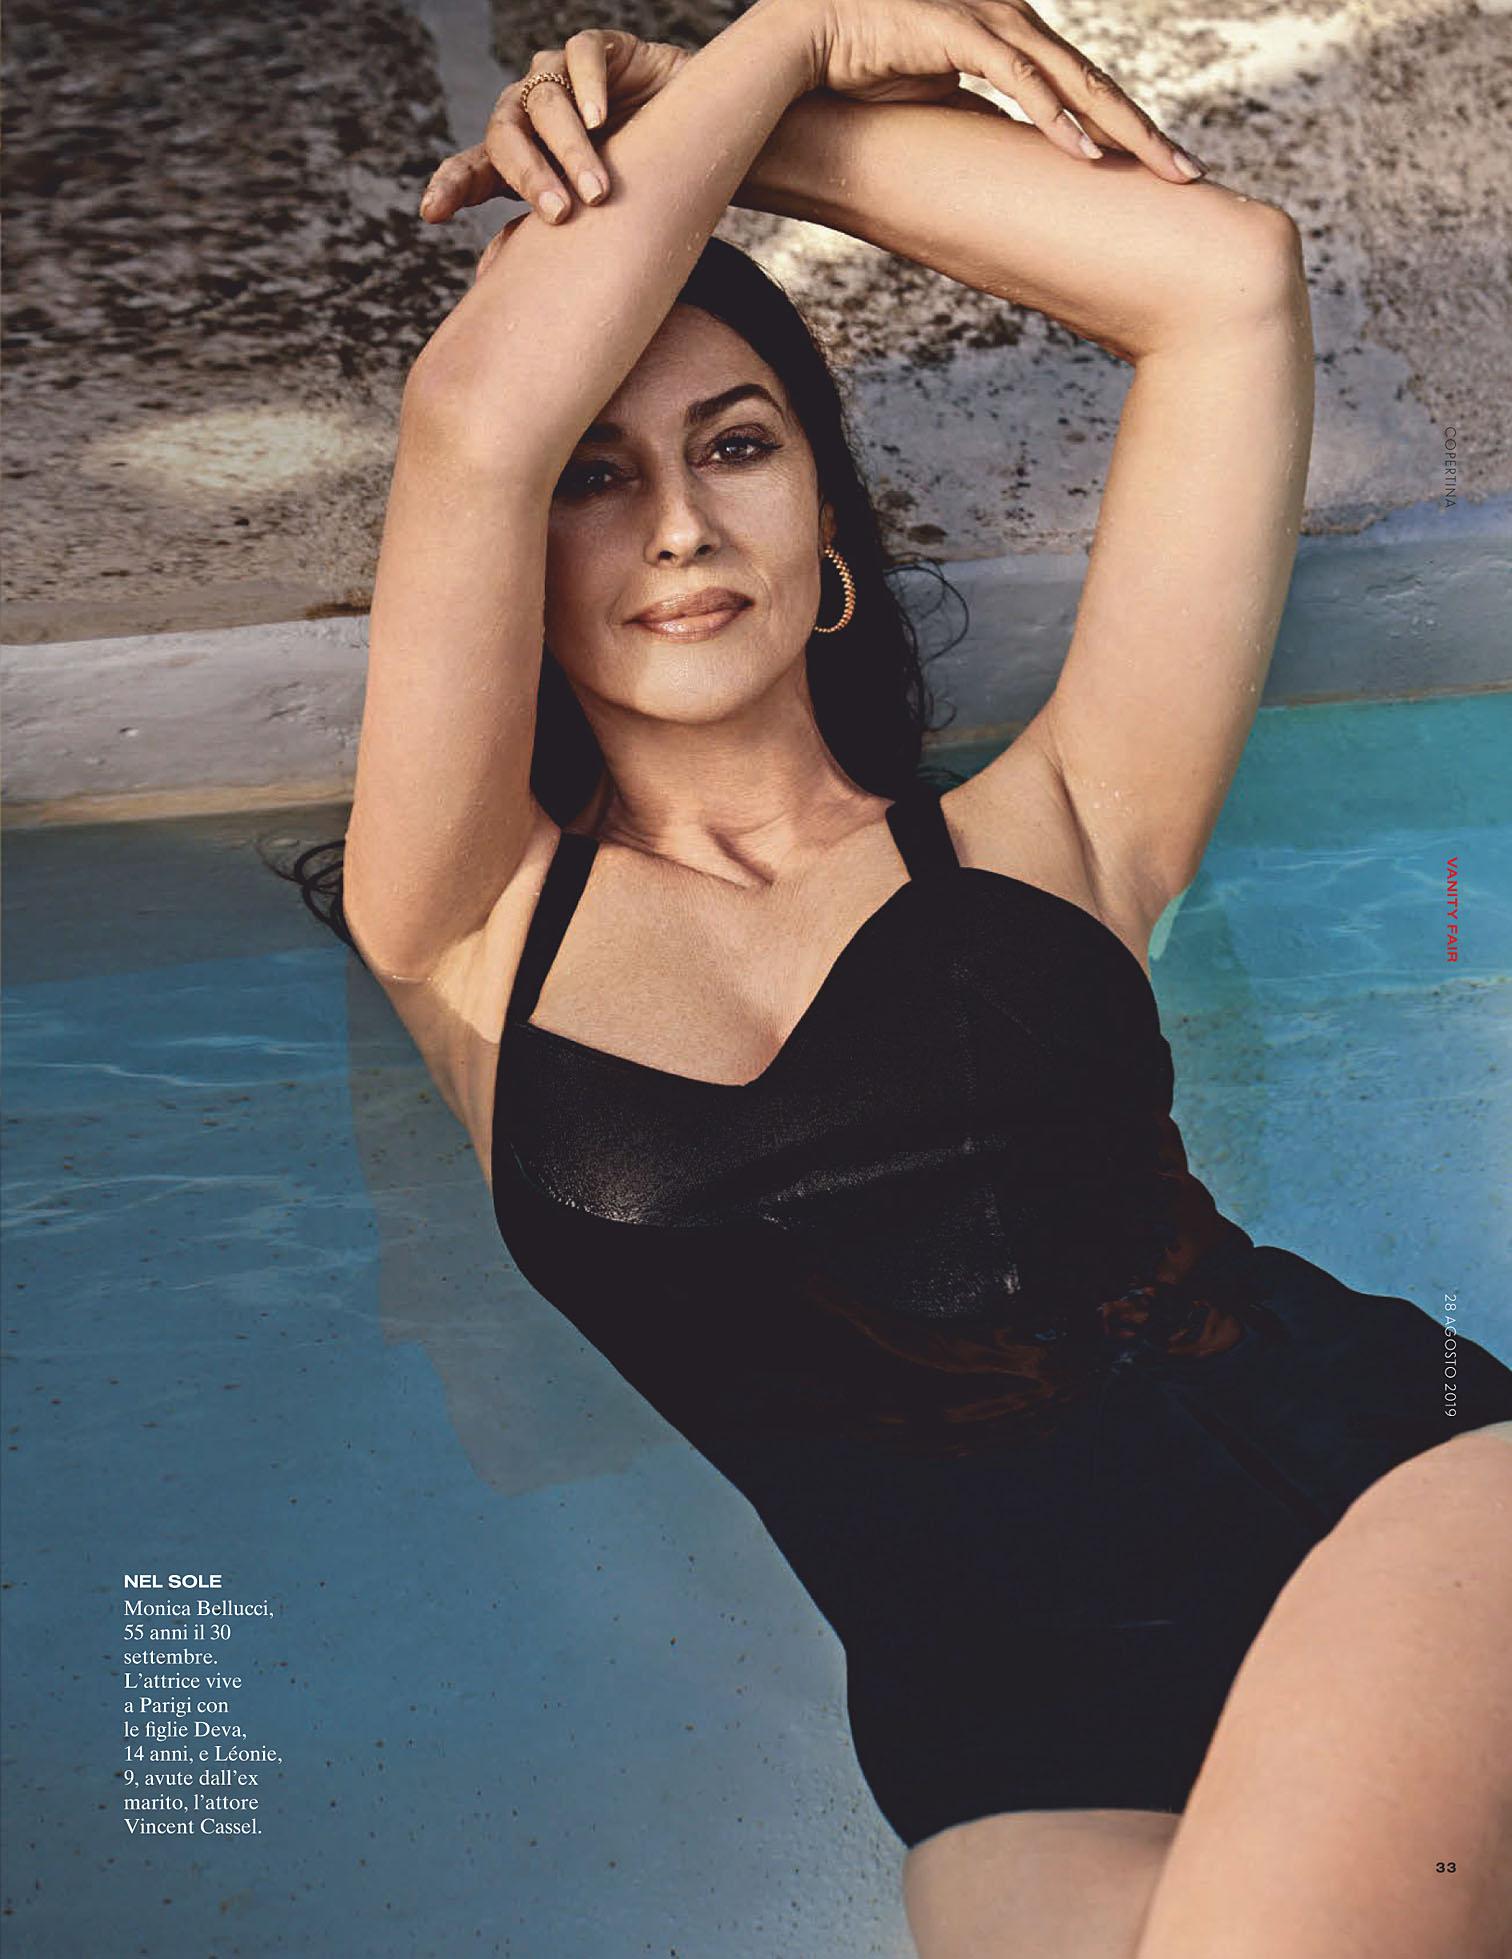 Vanity Fair Italia 2019-08-28 MBellucci3.jpg